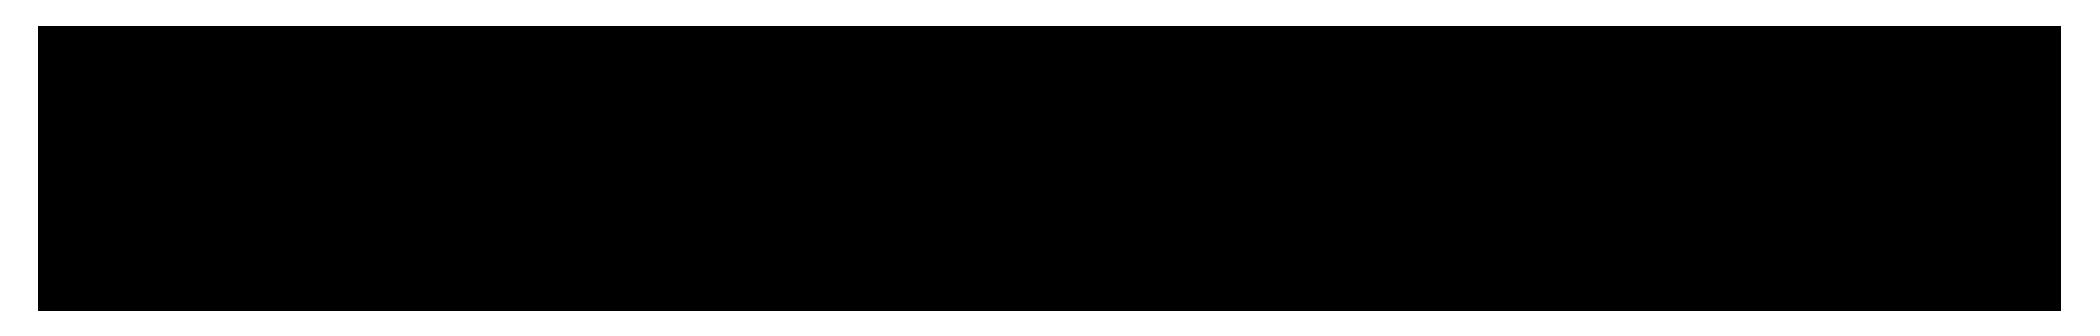 Cryotone_Logo.png